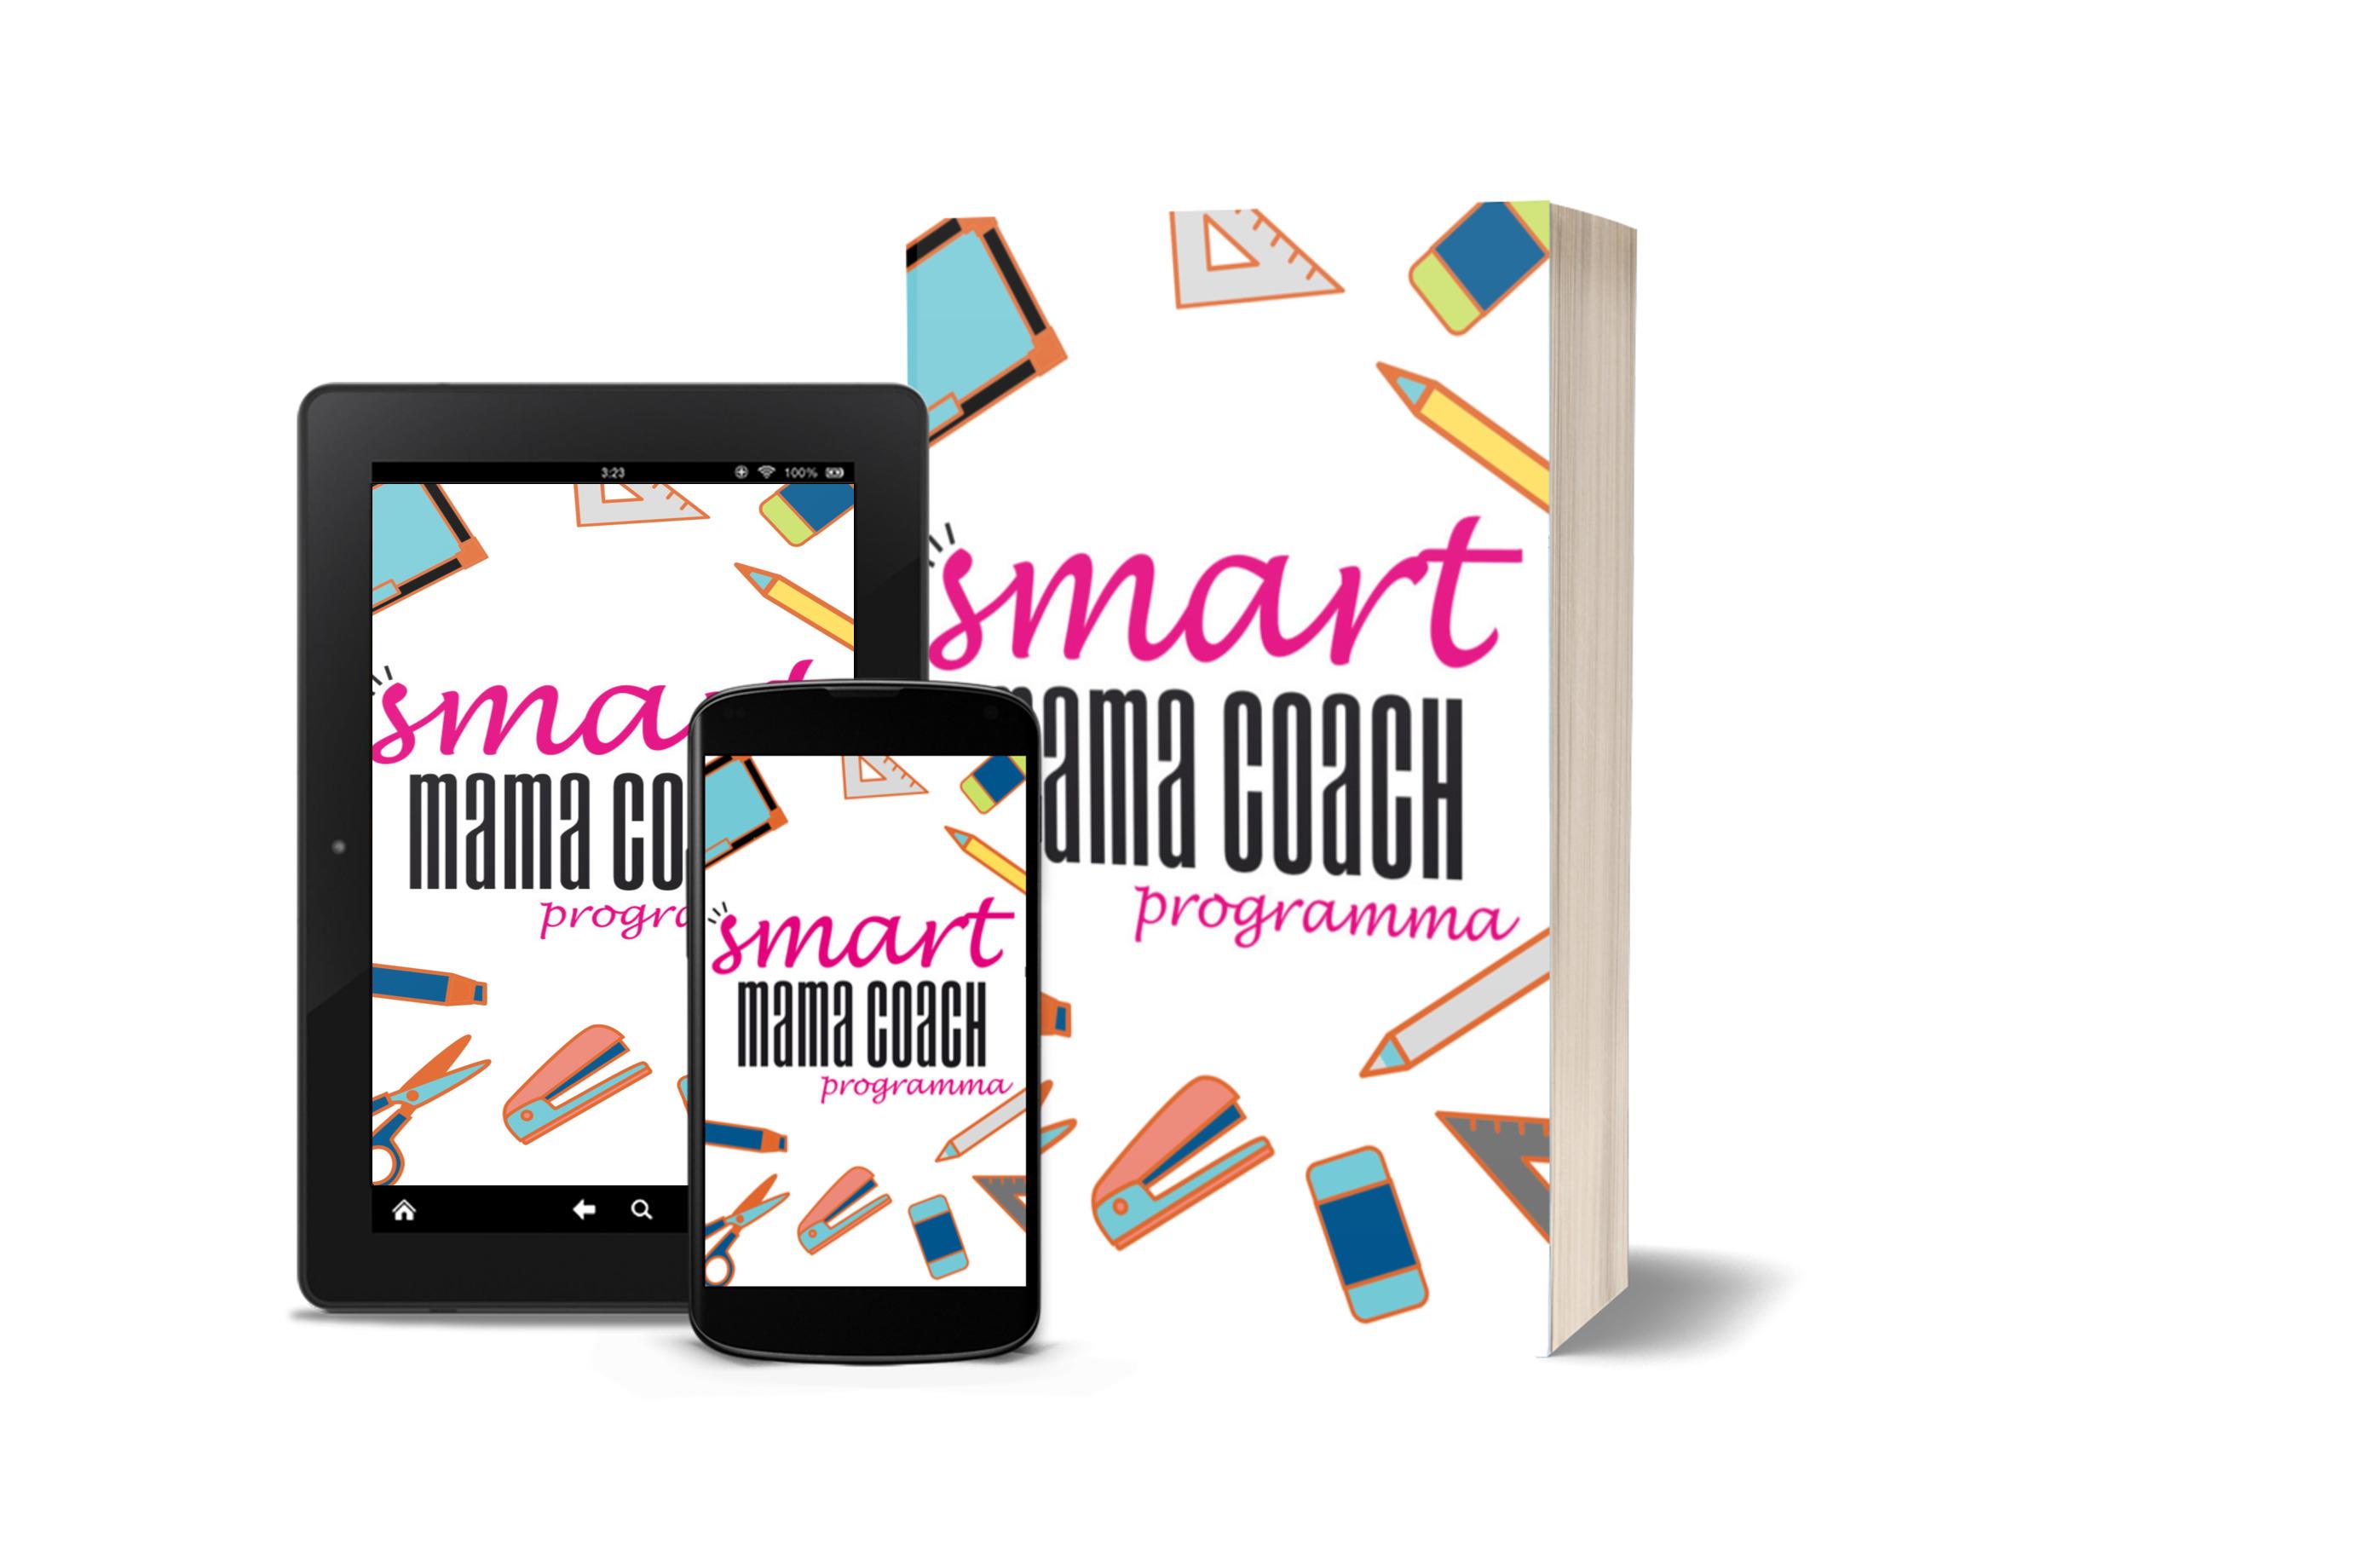 smc programma phone tablet en boek